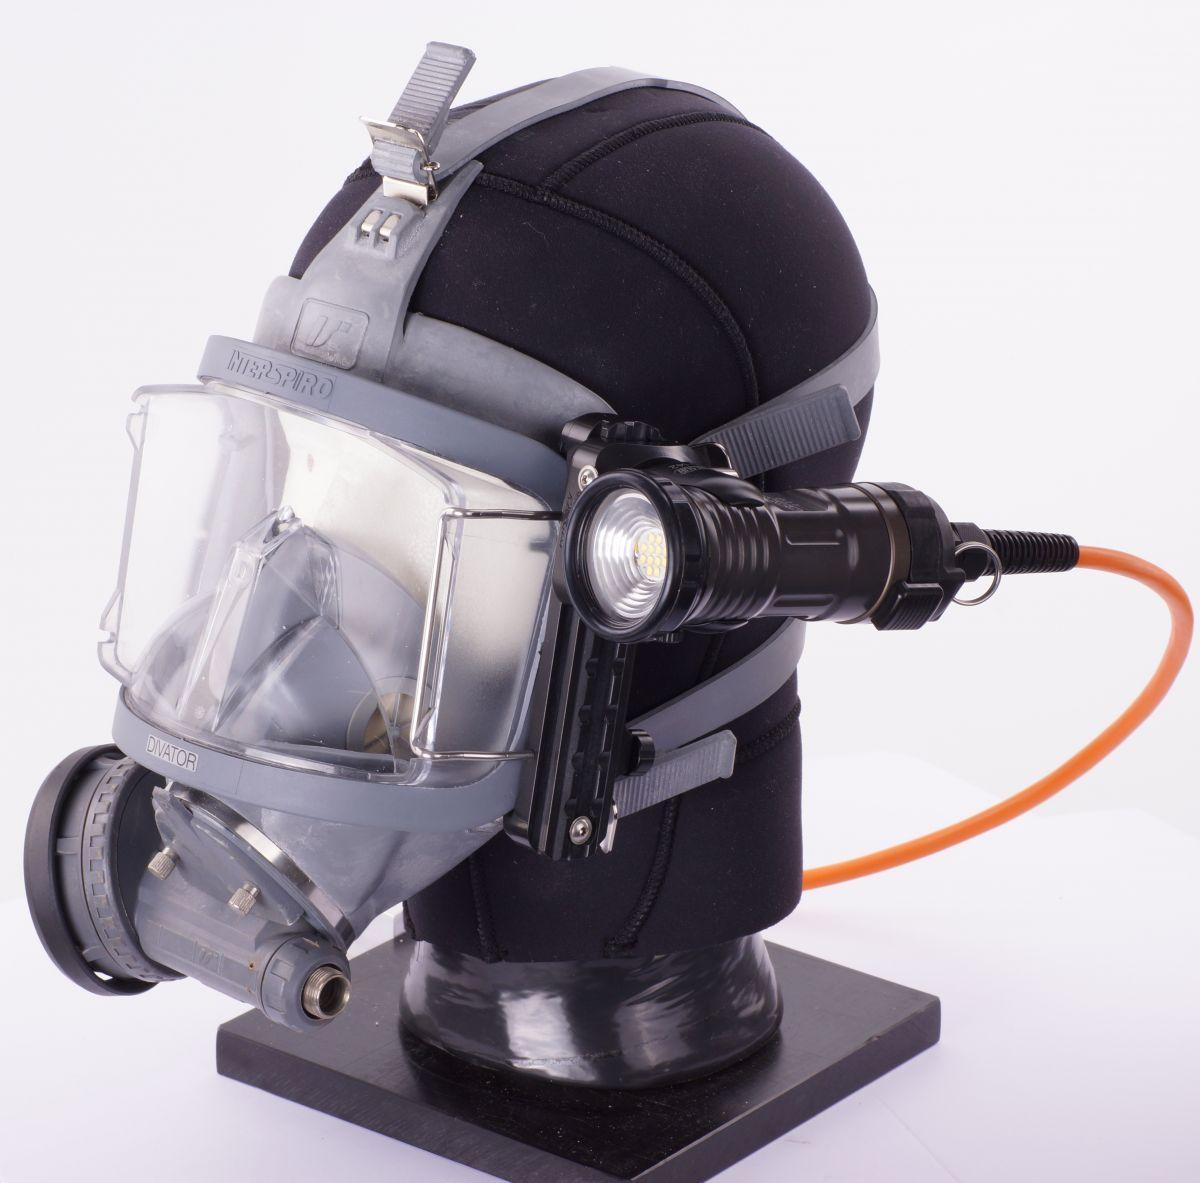 kabellamp vl1242 led5500 video light